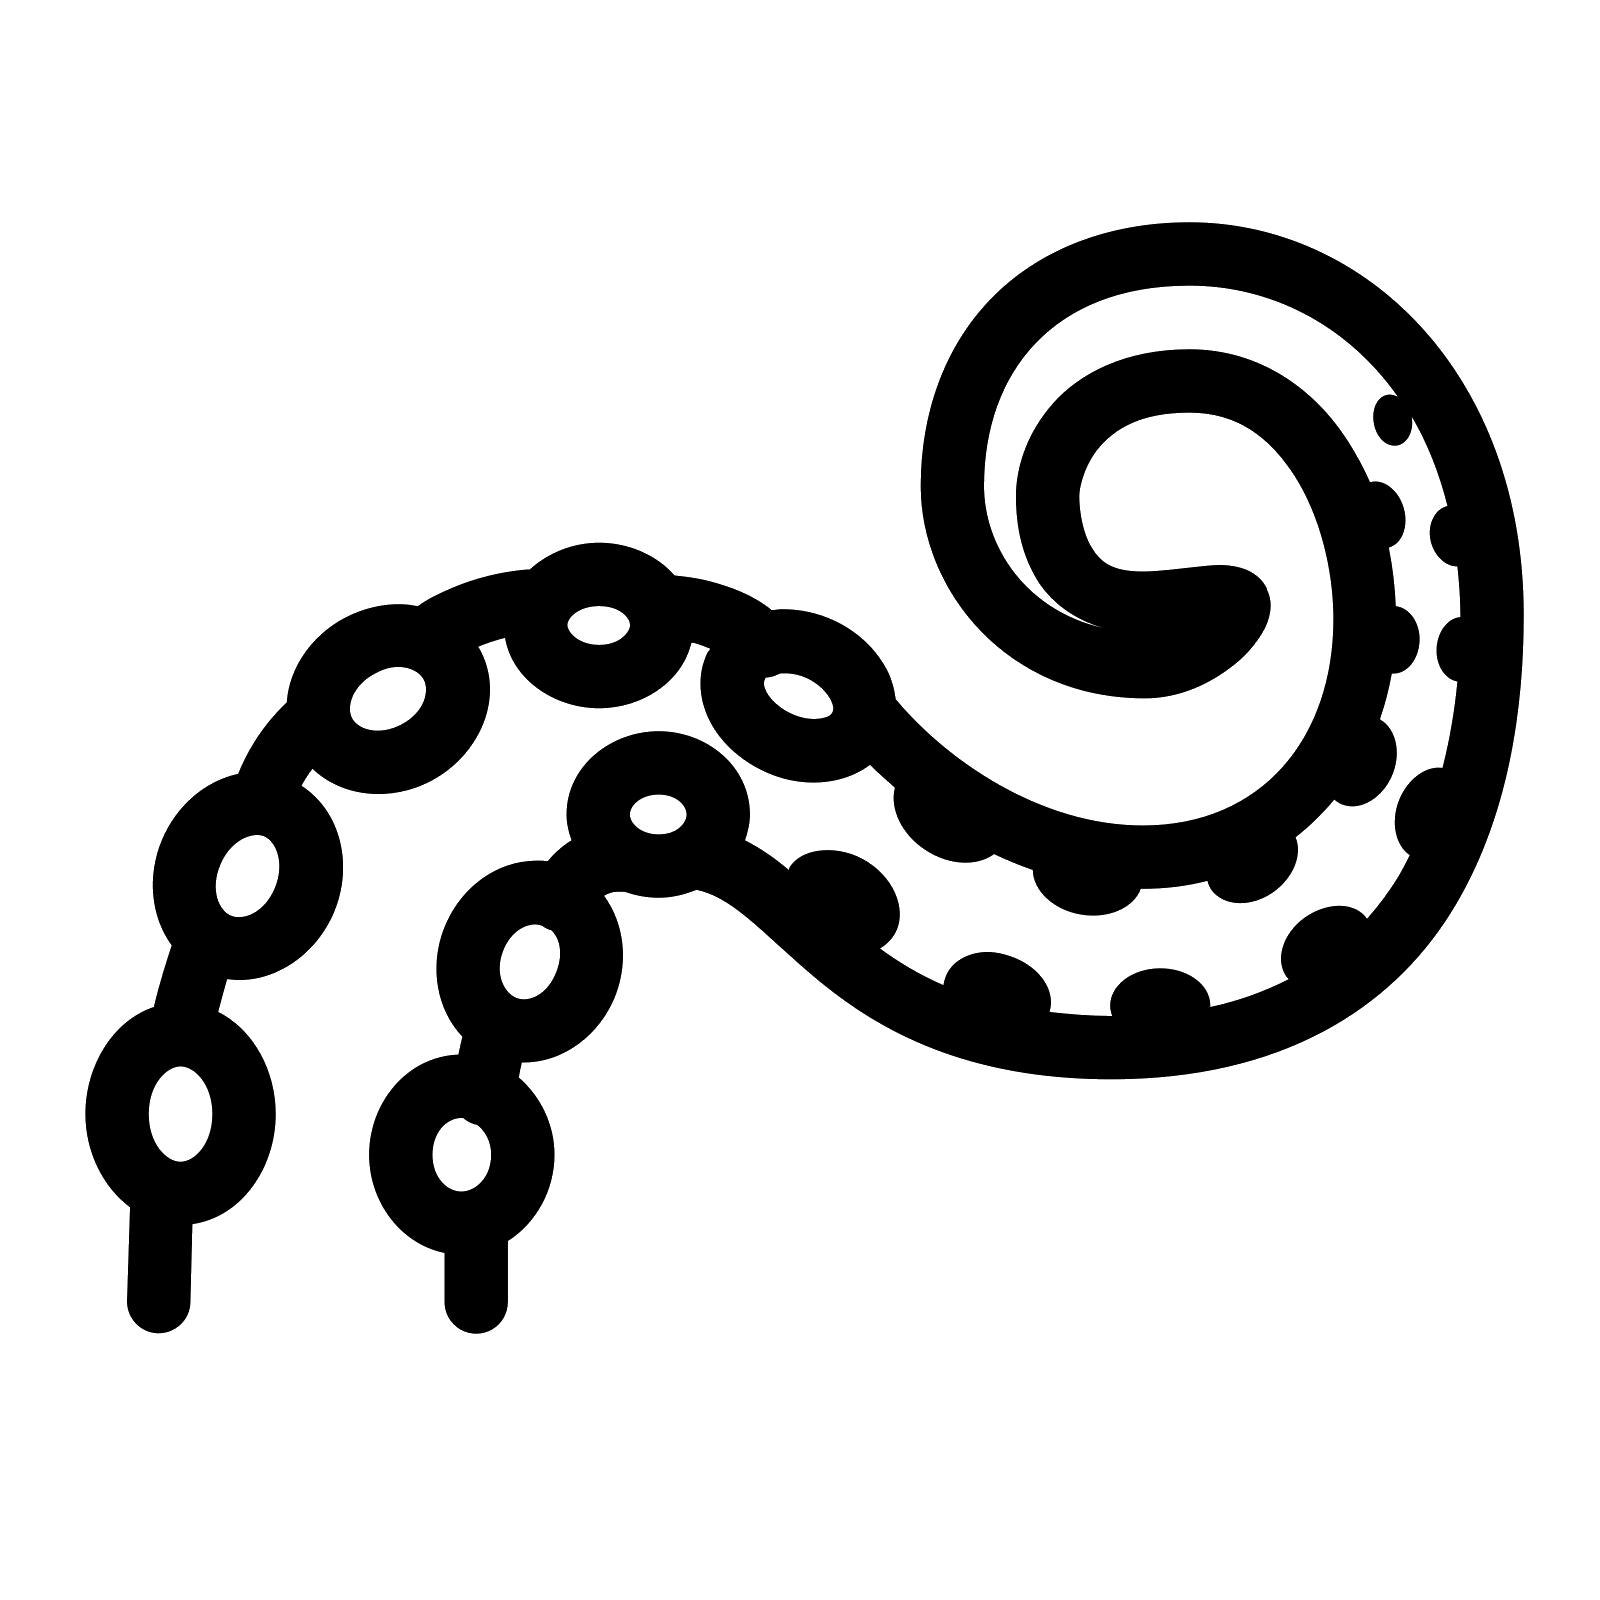 1600x1600 15 Vector Tentacles Clip Art For Free Download On Mbtskoudsalg